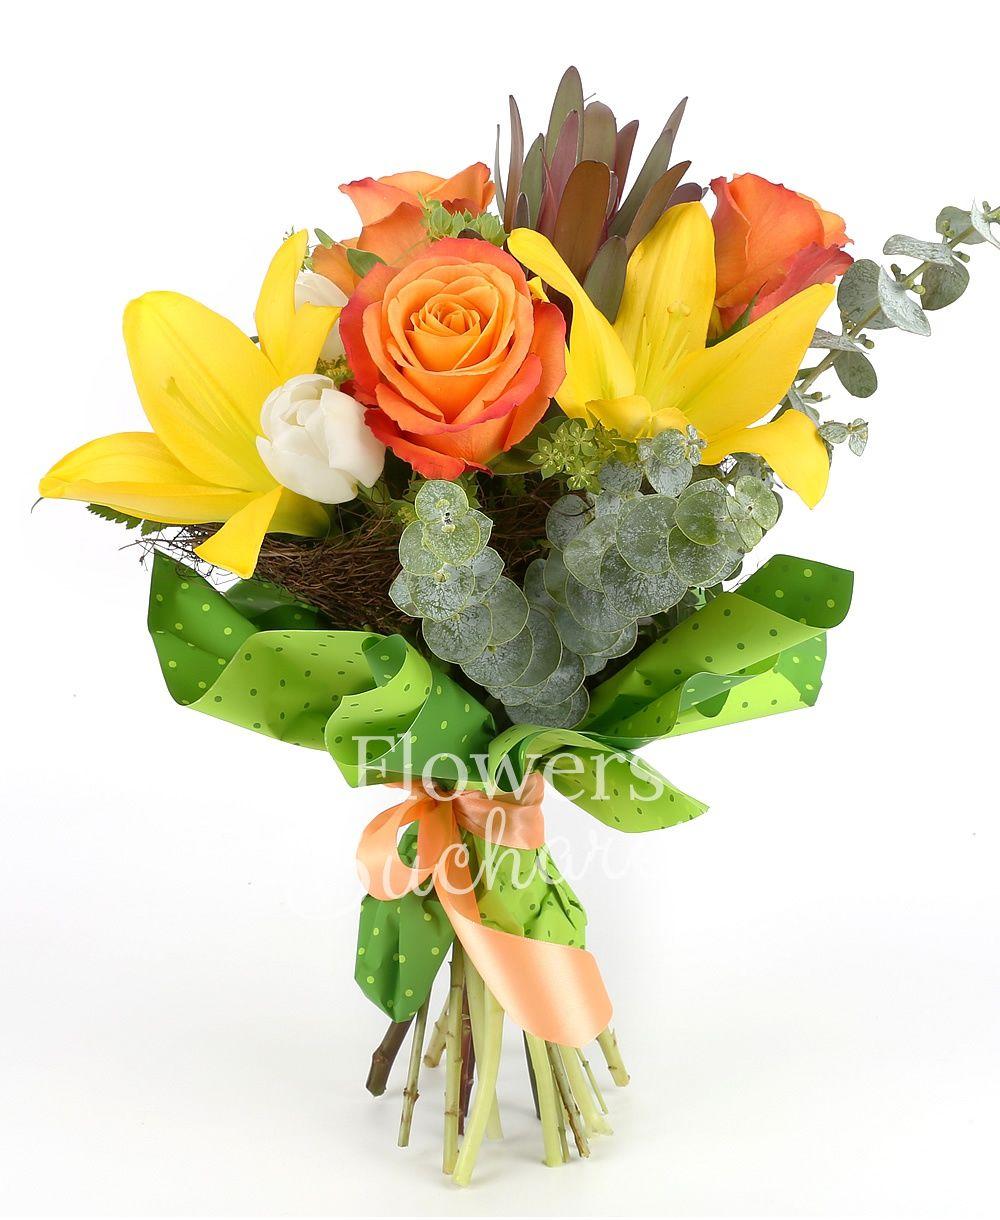 1 yellow lily, 3 orange roses, 2 leucadendron. 3 green hypericum, 5 white tulips, greenery